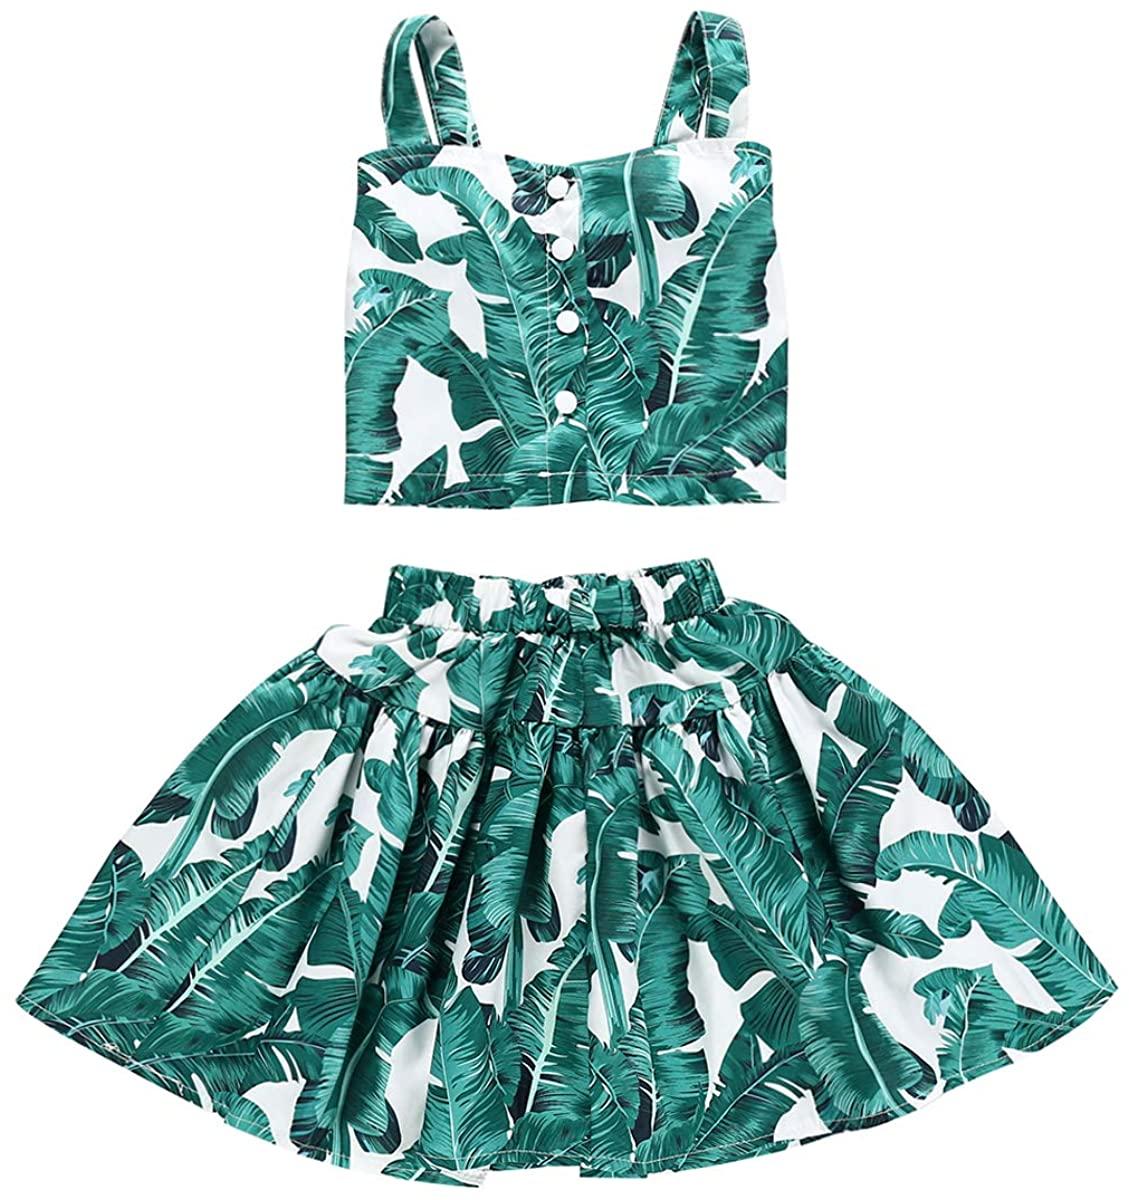 Kids Toddler Baby Girls Summer Dress Outfits Leaf Print Shirt+Ruffled Skirt Dresses Beachwear Sunsuit Clothes Set